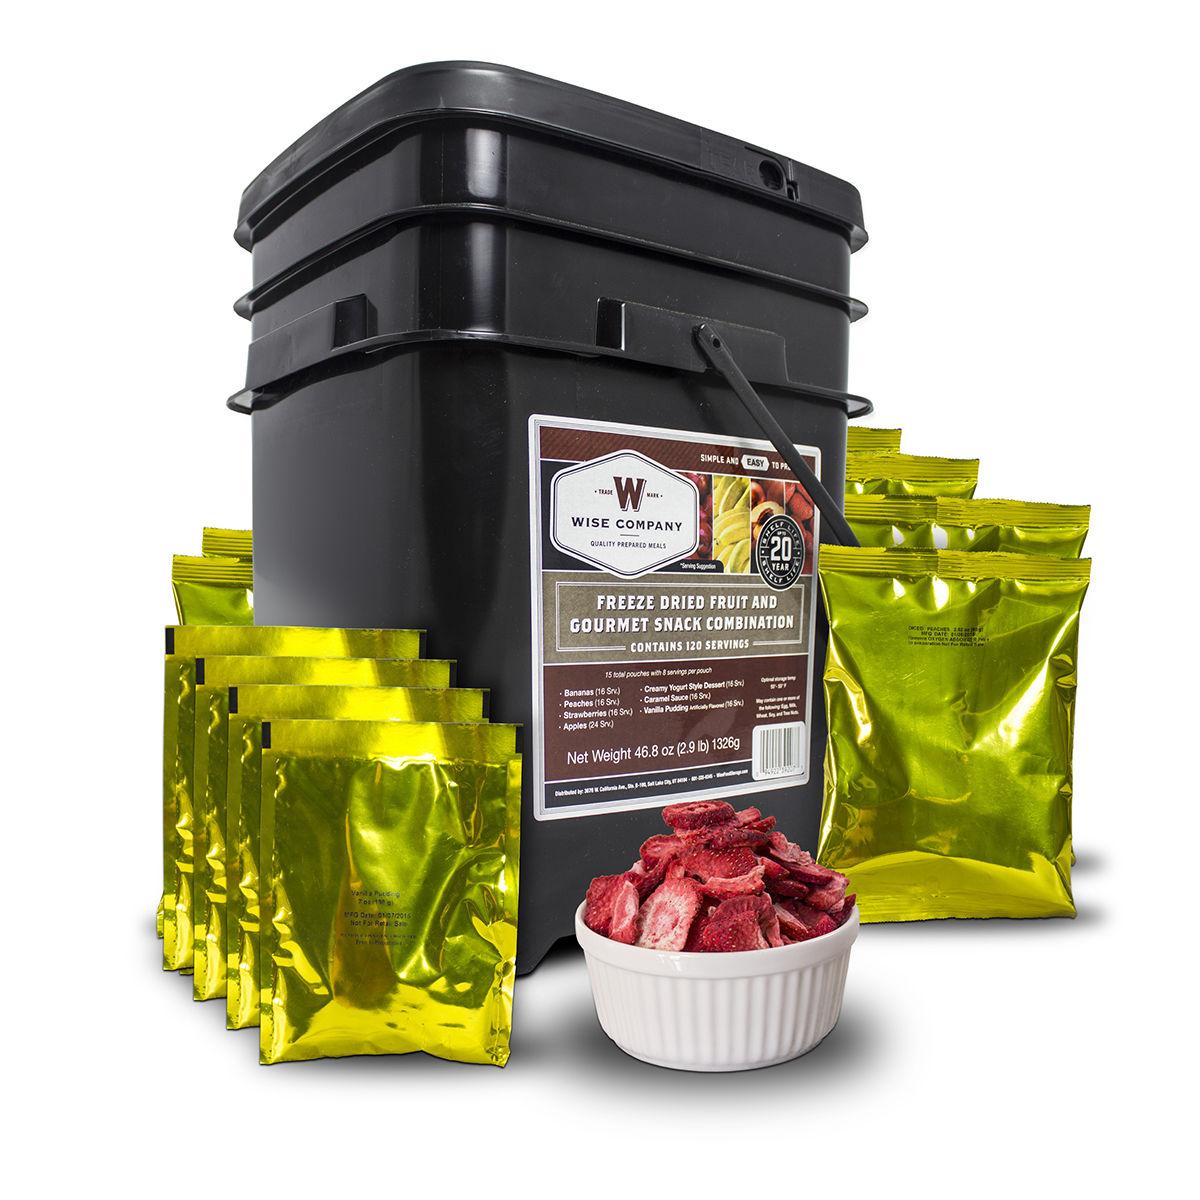 120 servings of Wise Emergency Survival Freeze Dried Fruit Food Storage 1